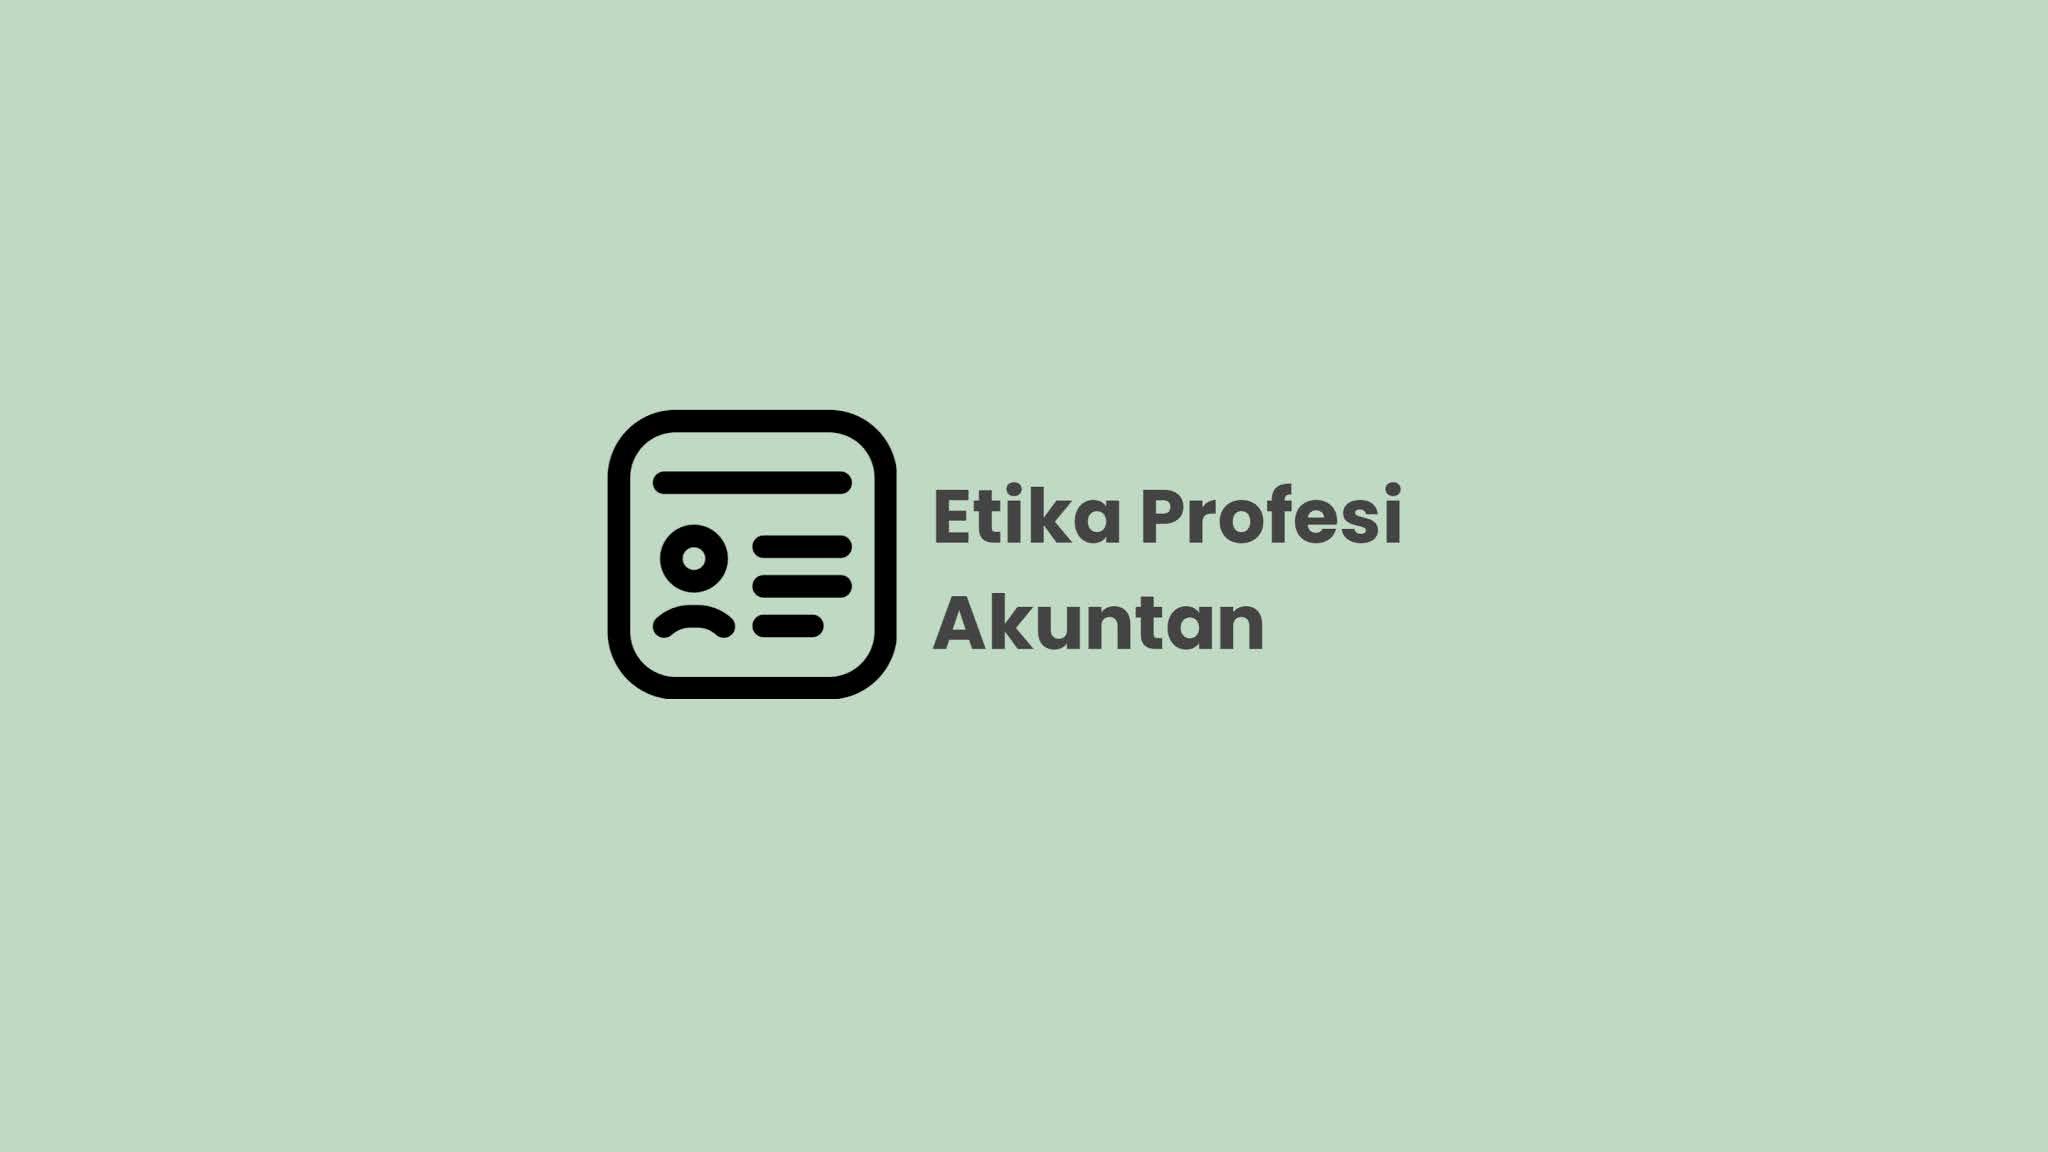 Etika Profesi Akuntan